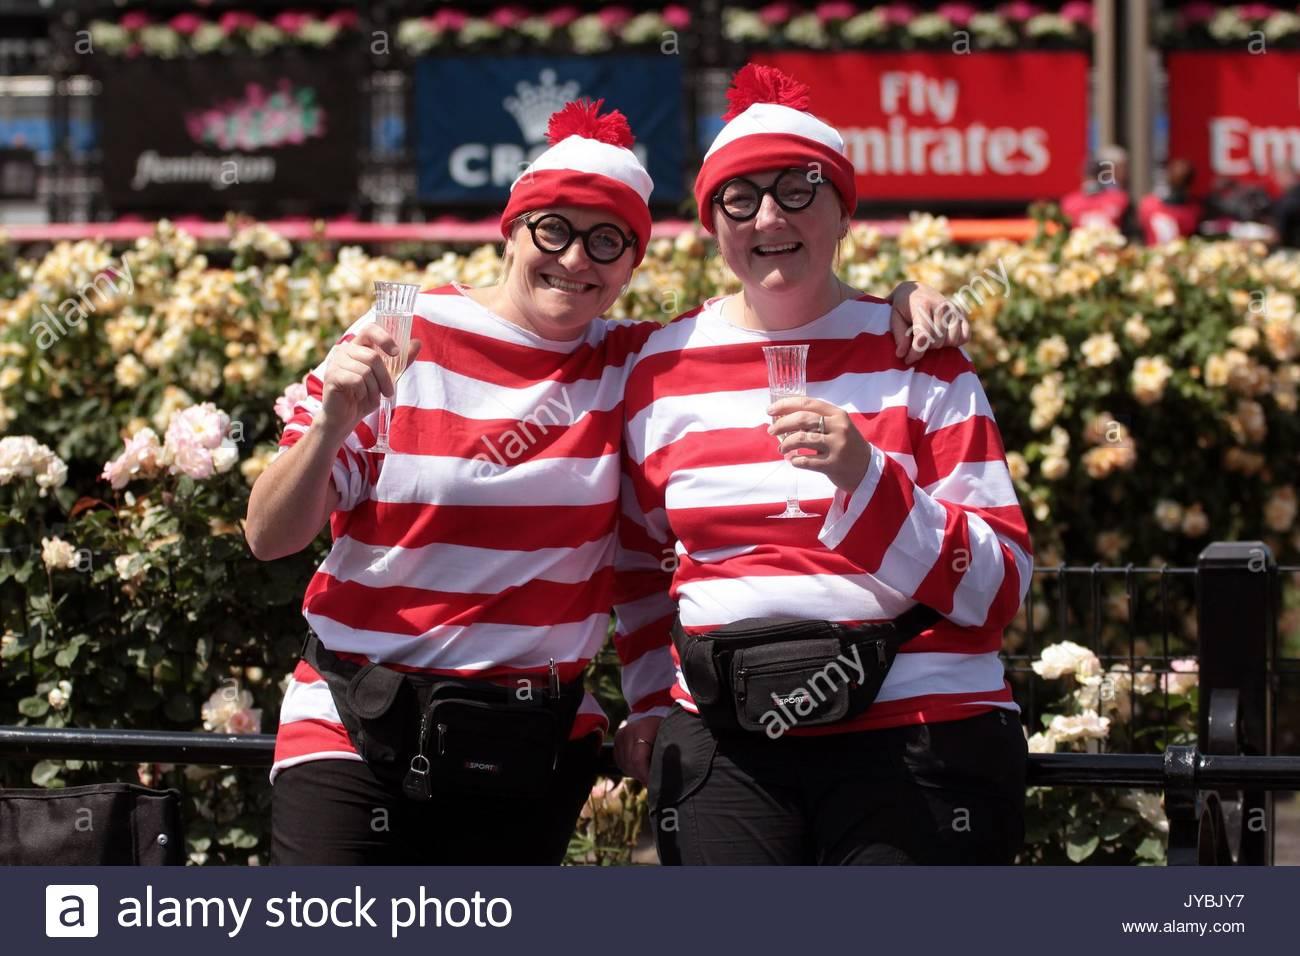 flemington senior personals Flemington's best 100% free dating site meeting nice single men in flemington  can seem hopeless at times — but it doesn't have to be mingle2's flemington.